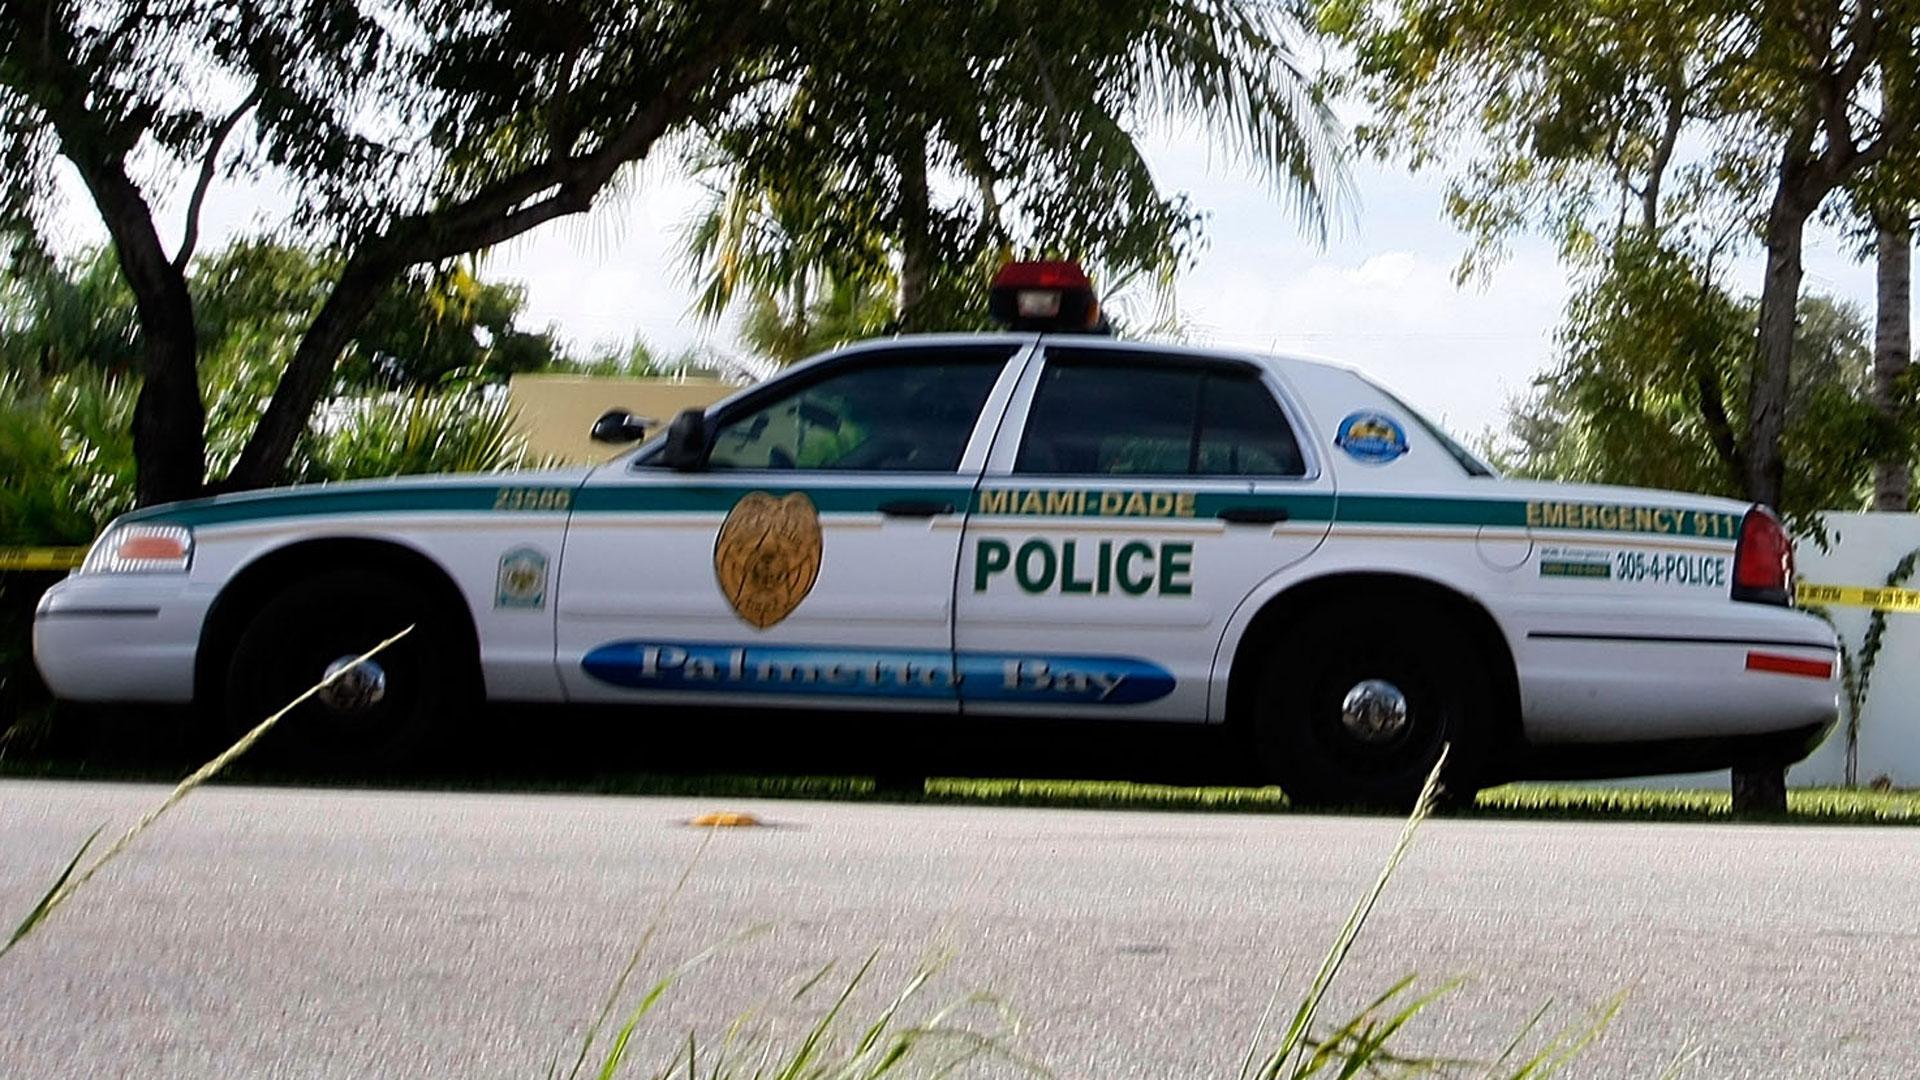 Miami police